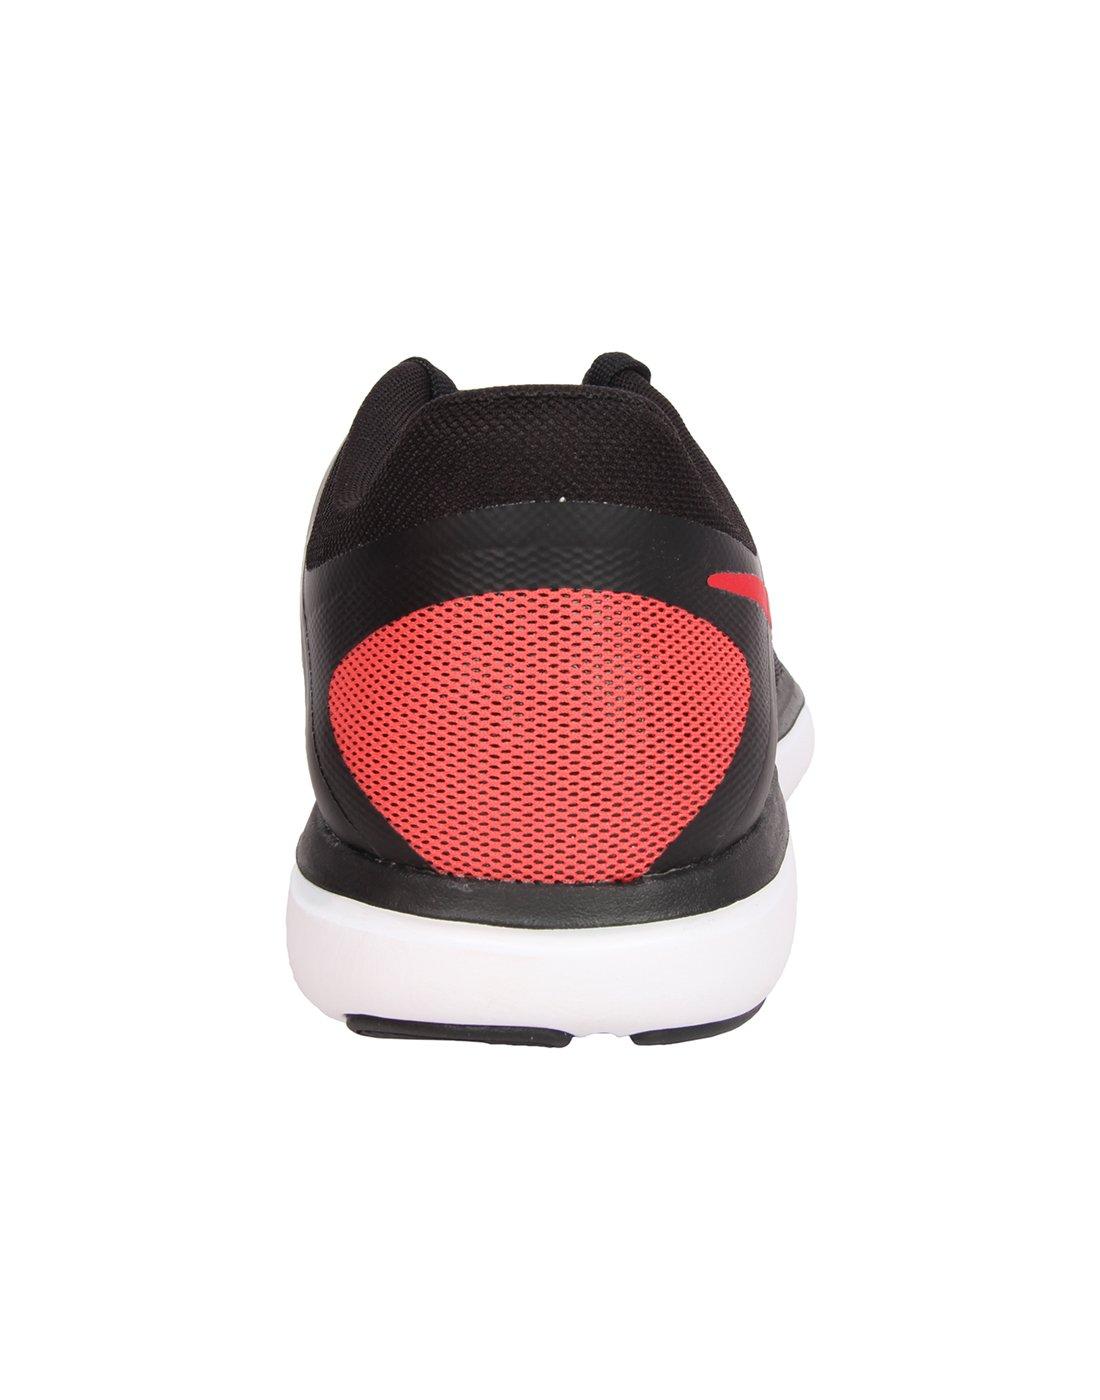 NIKE Men's Flex 2014 RN Running Shoe B01CITM7G0 Glow/White 13 D(M) US|Black/University Red/Ember Glow/White B01CITM7G0 983047